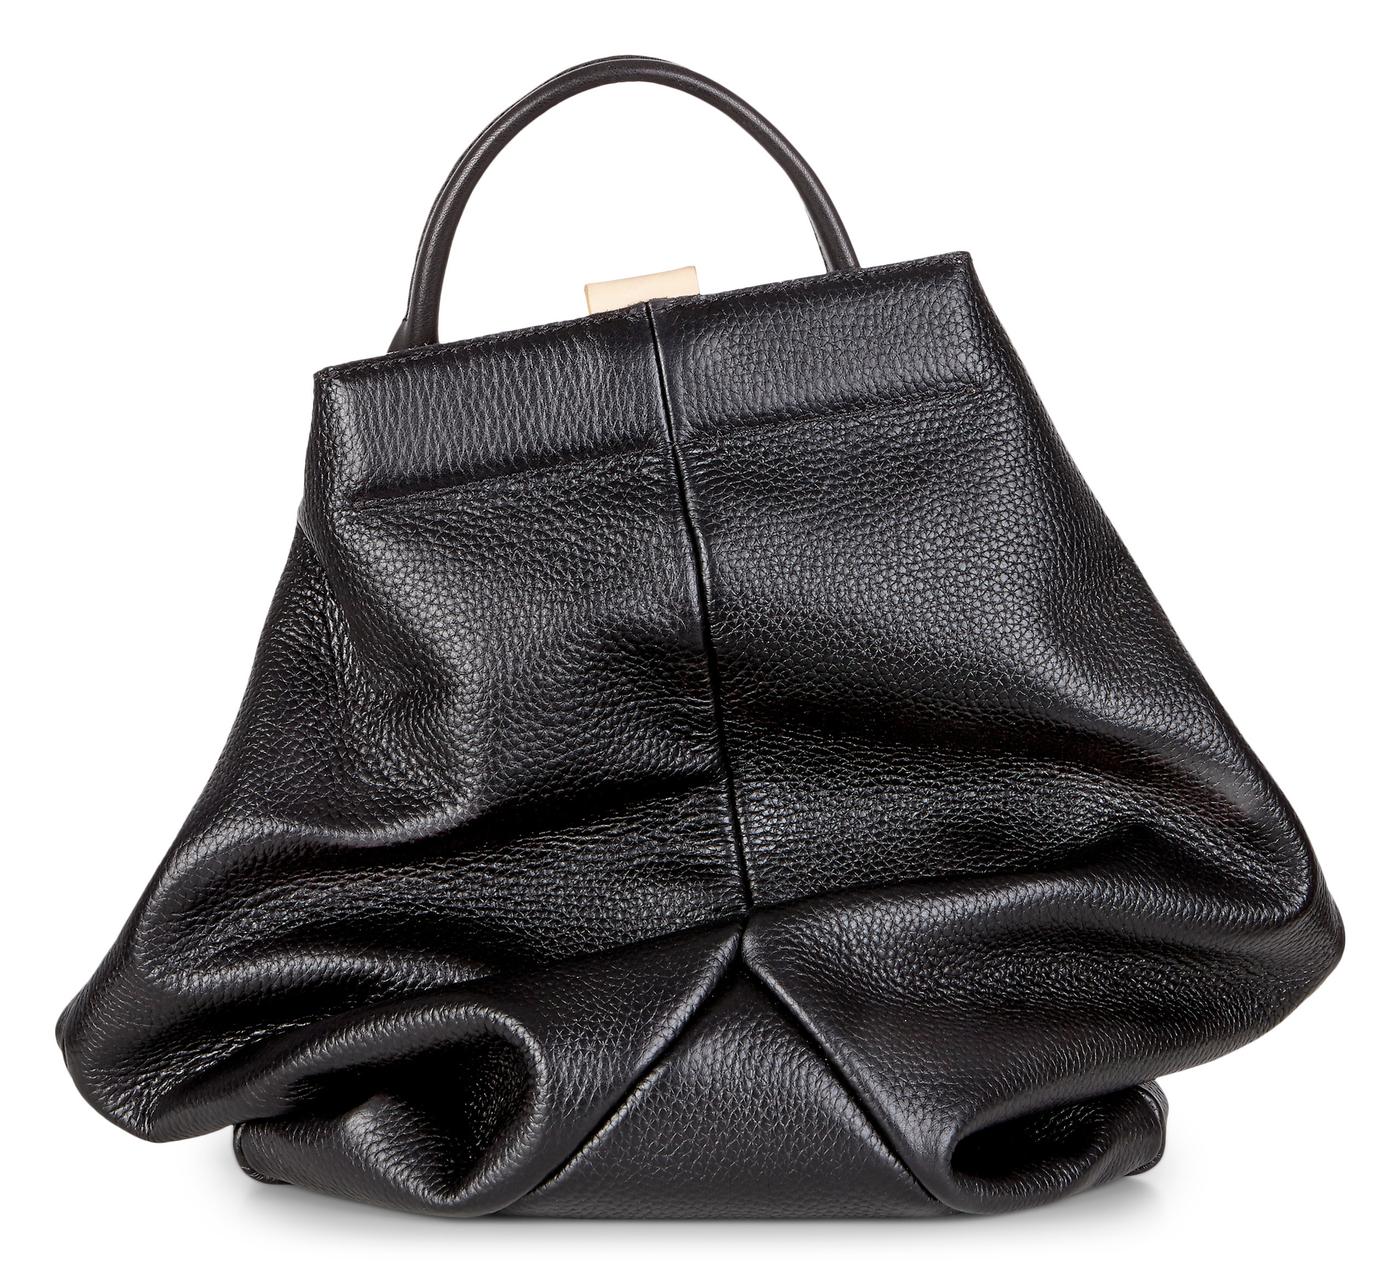 ECCO ELLA Tote Bag